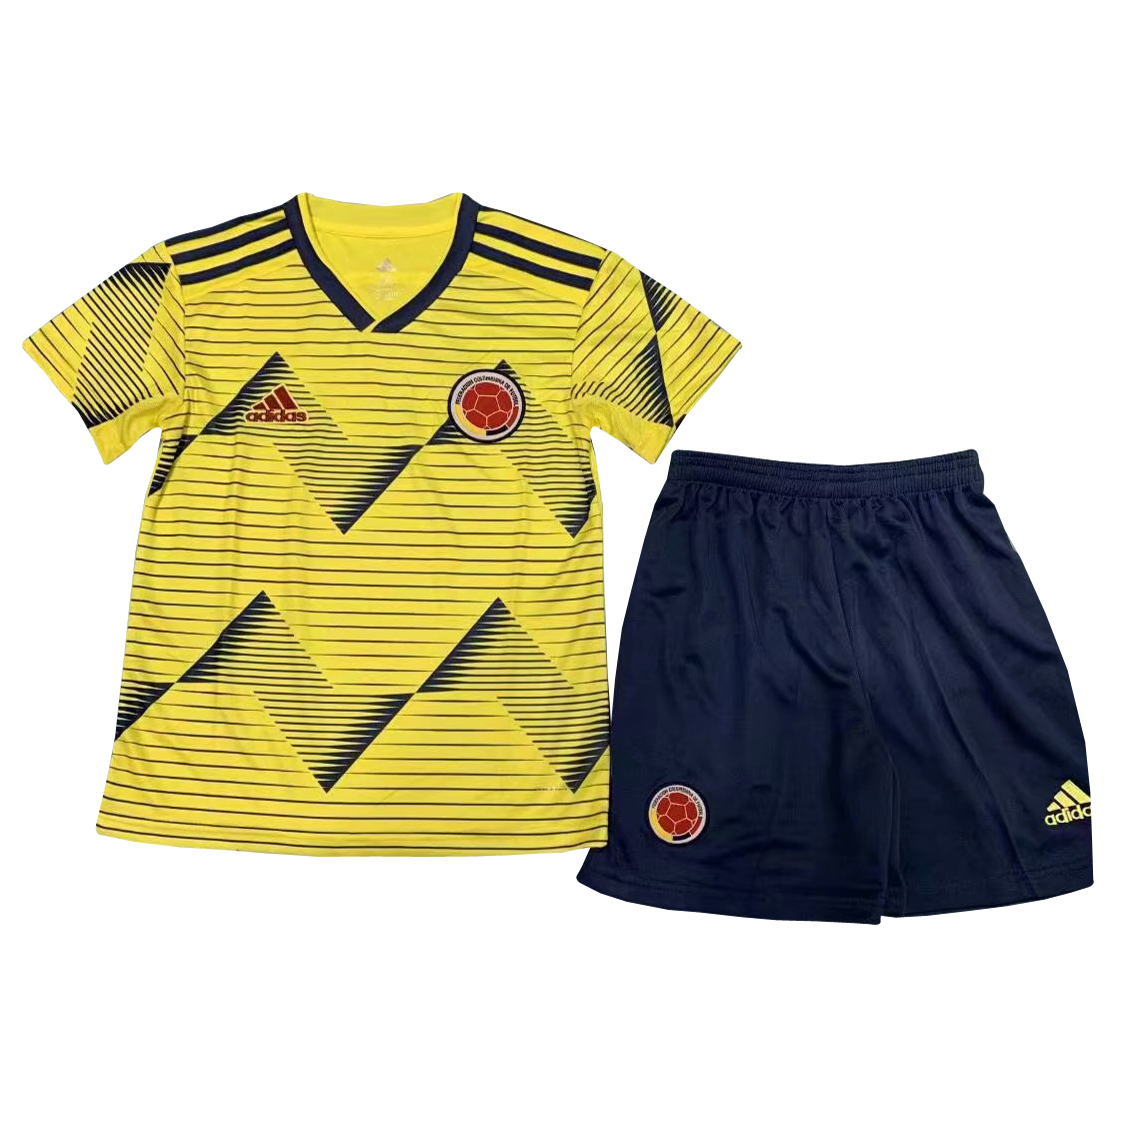 8ede53ca623 US$ 14.8 - Colombia Copa America 2019 Home Jersey Kids' -  www.fcsoccerworld.com